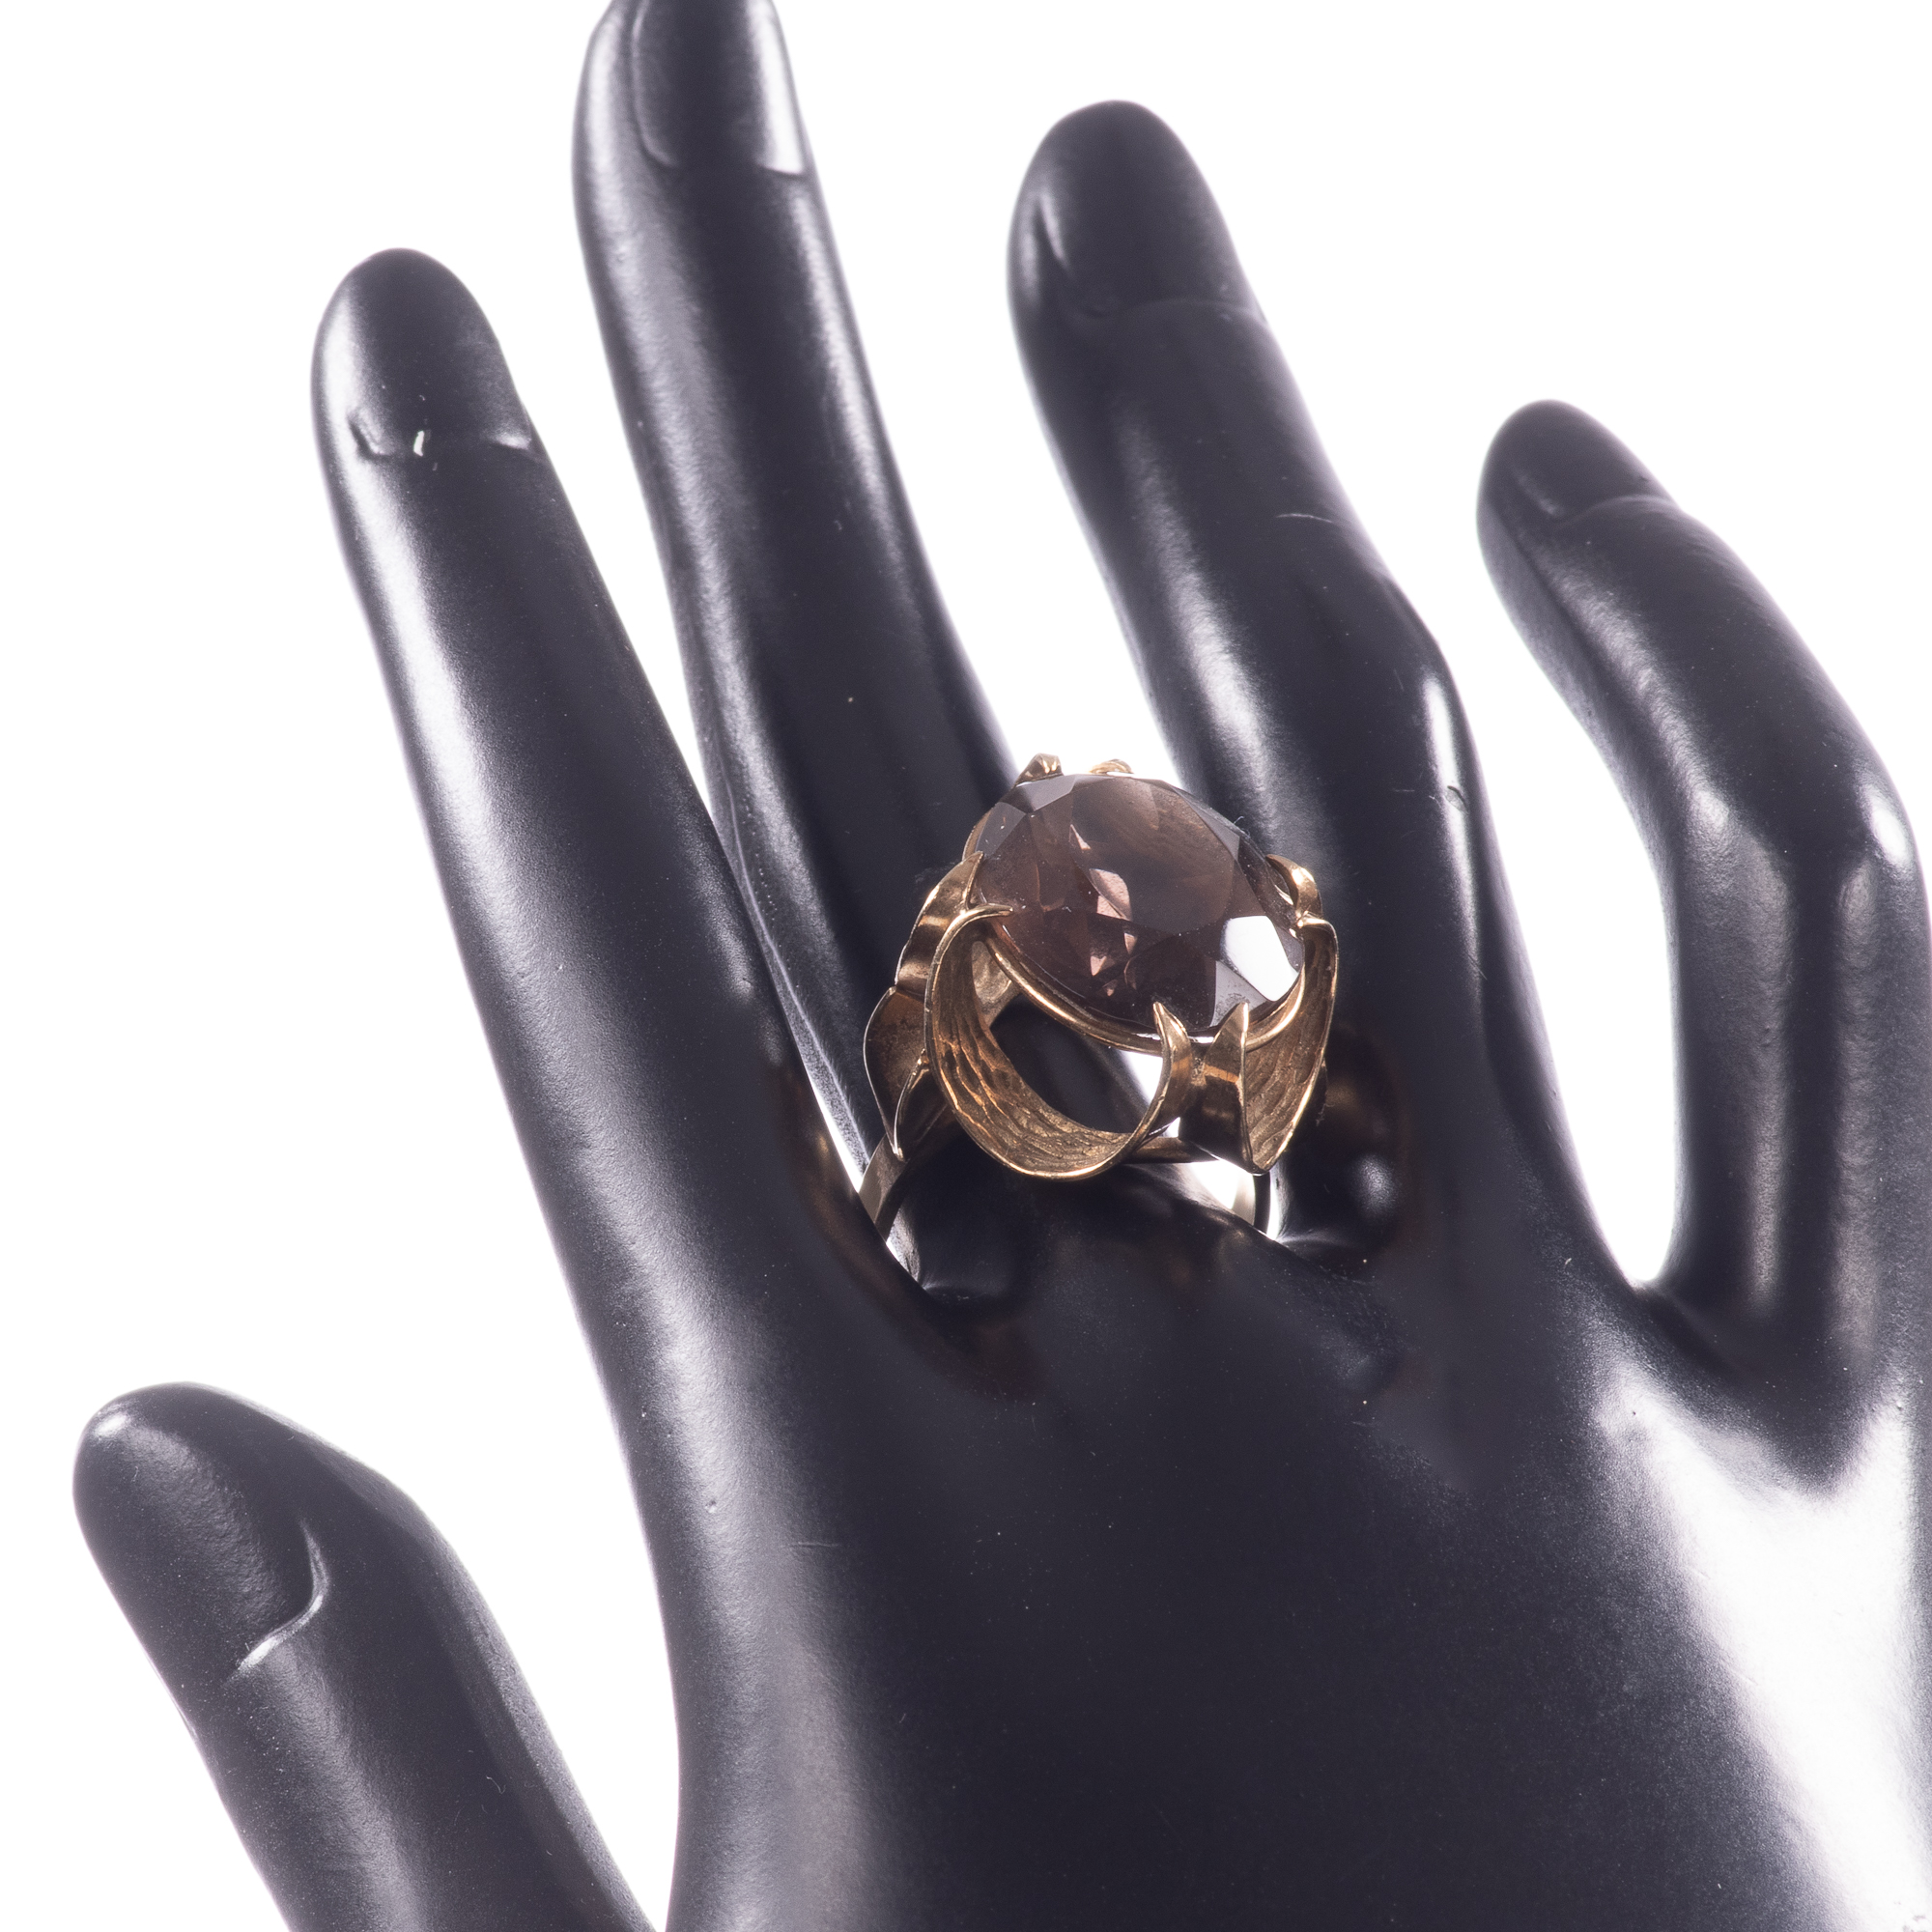 9ct Gold 12.75ct Smoky Quartz Ring - Image 2 of 7